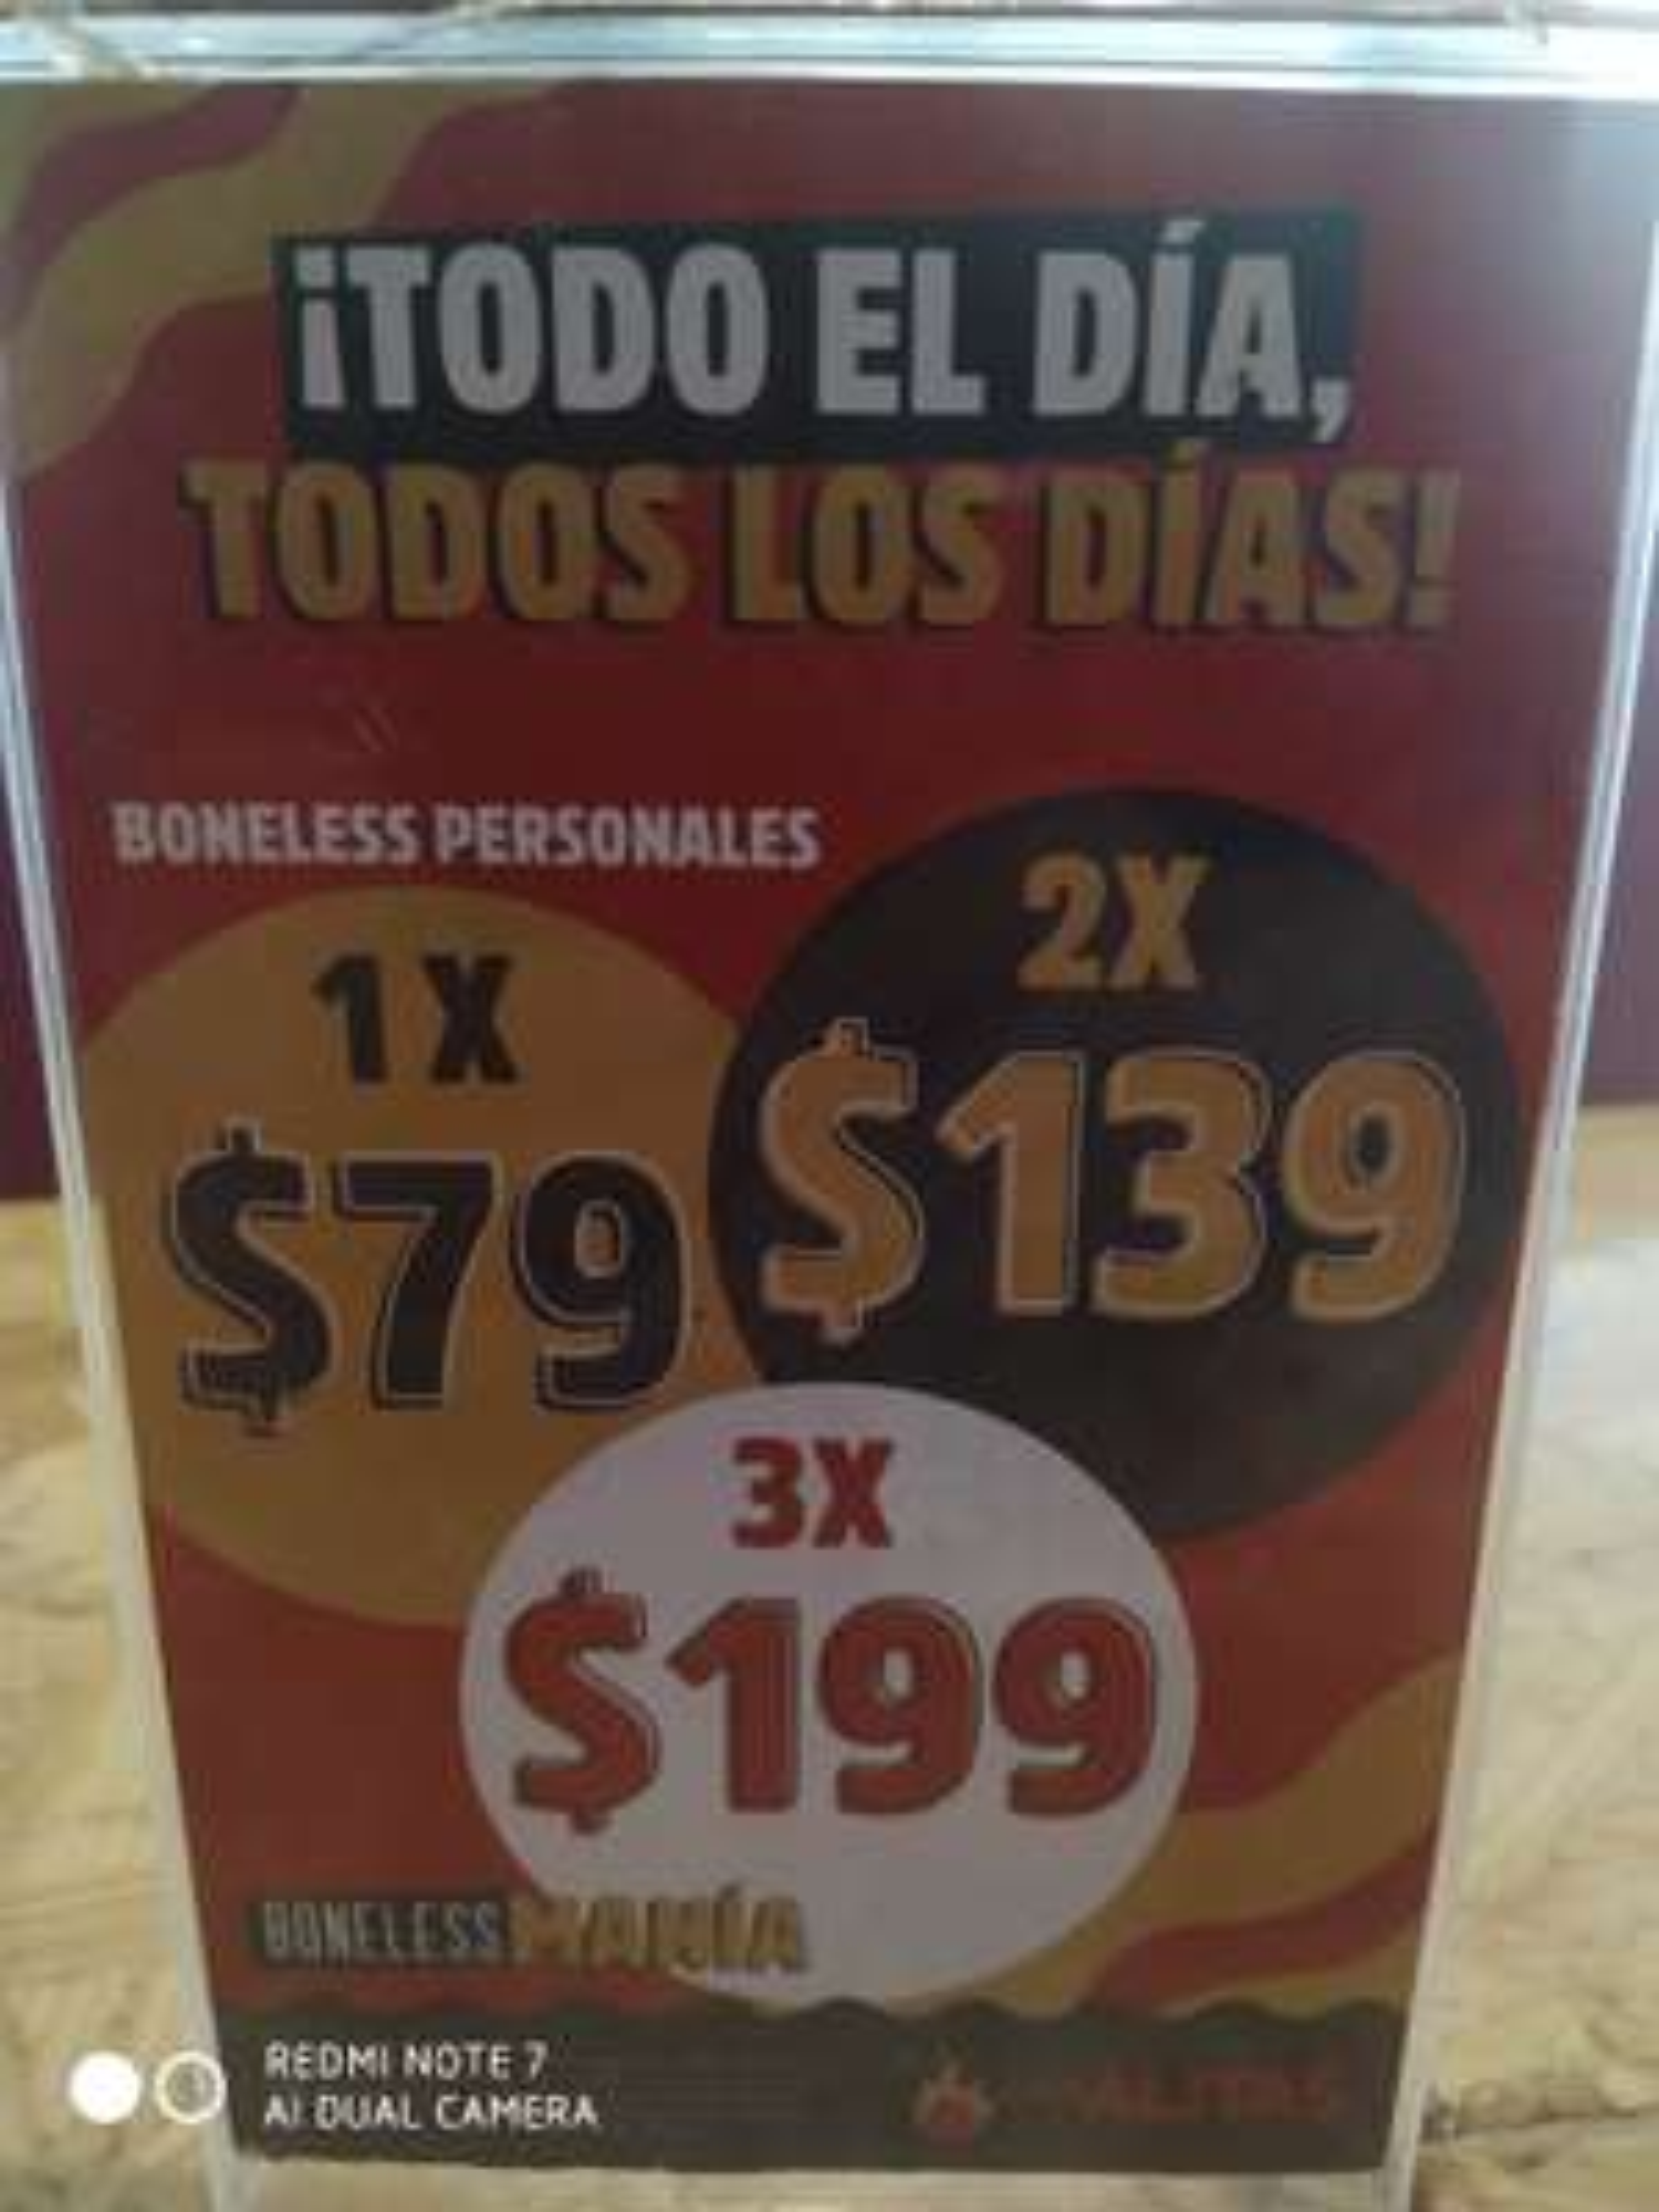 Las alitas lomas estrella CDMX : Promoción de boneless, 1x$79.00, 2x139 o 3x$199.00